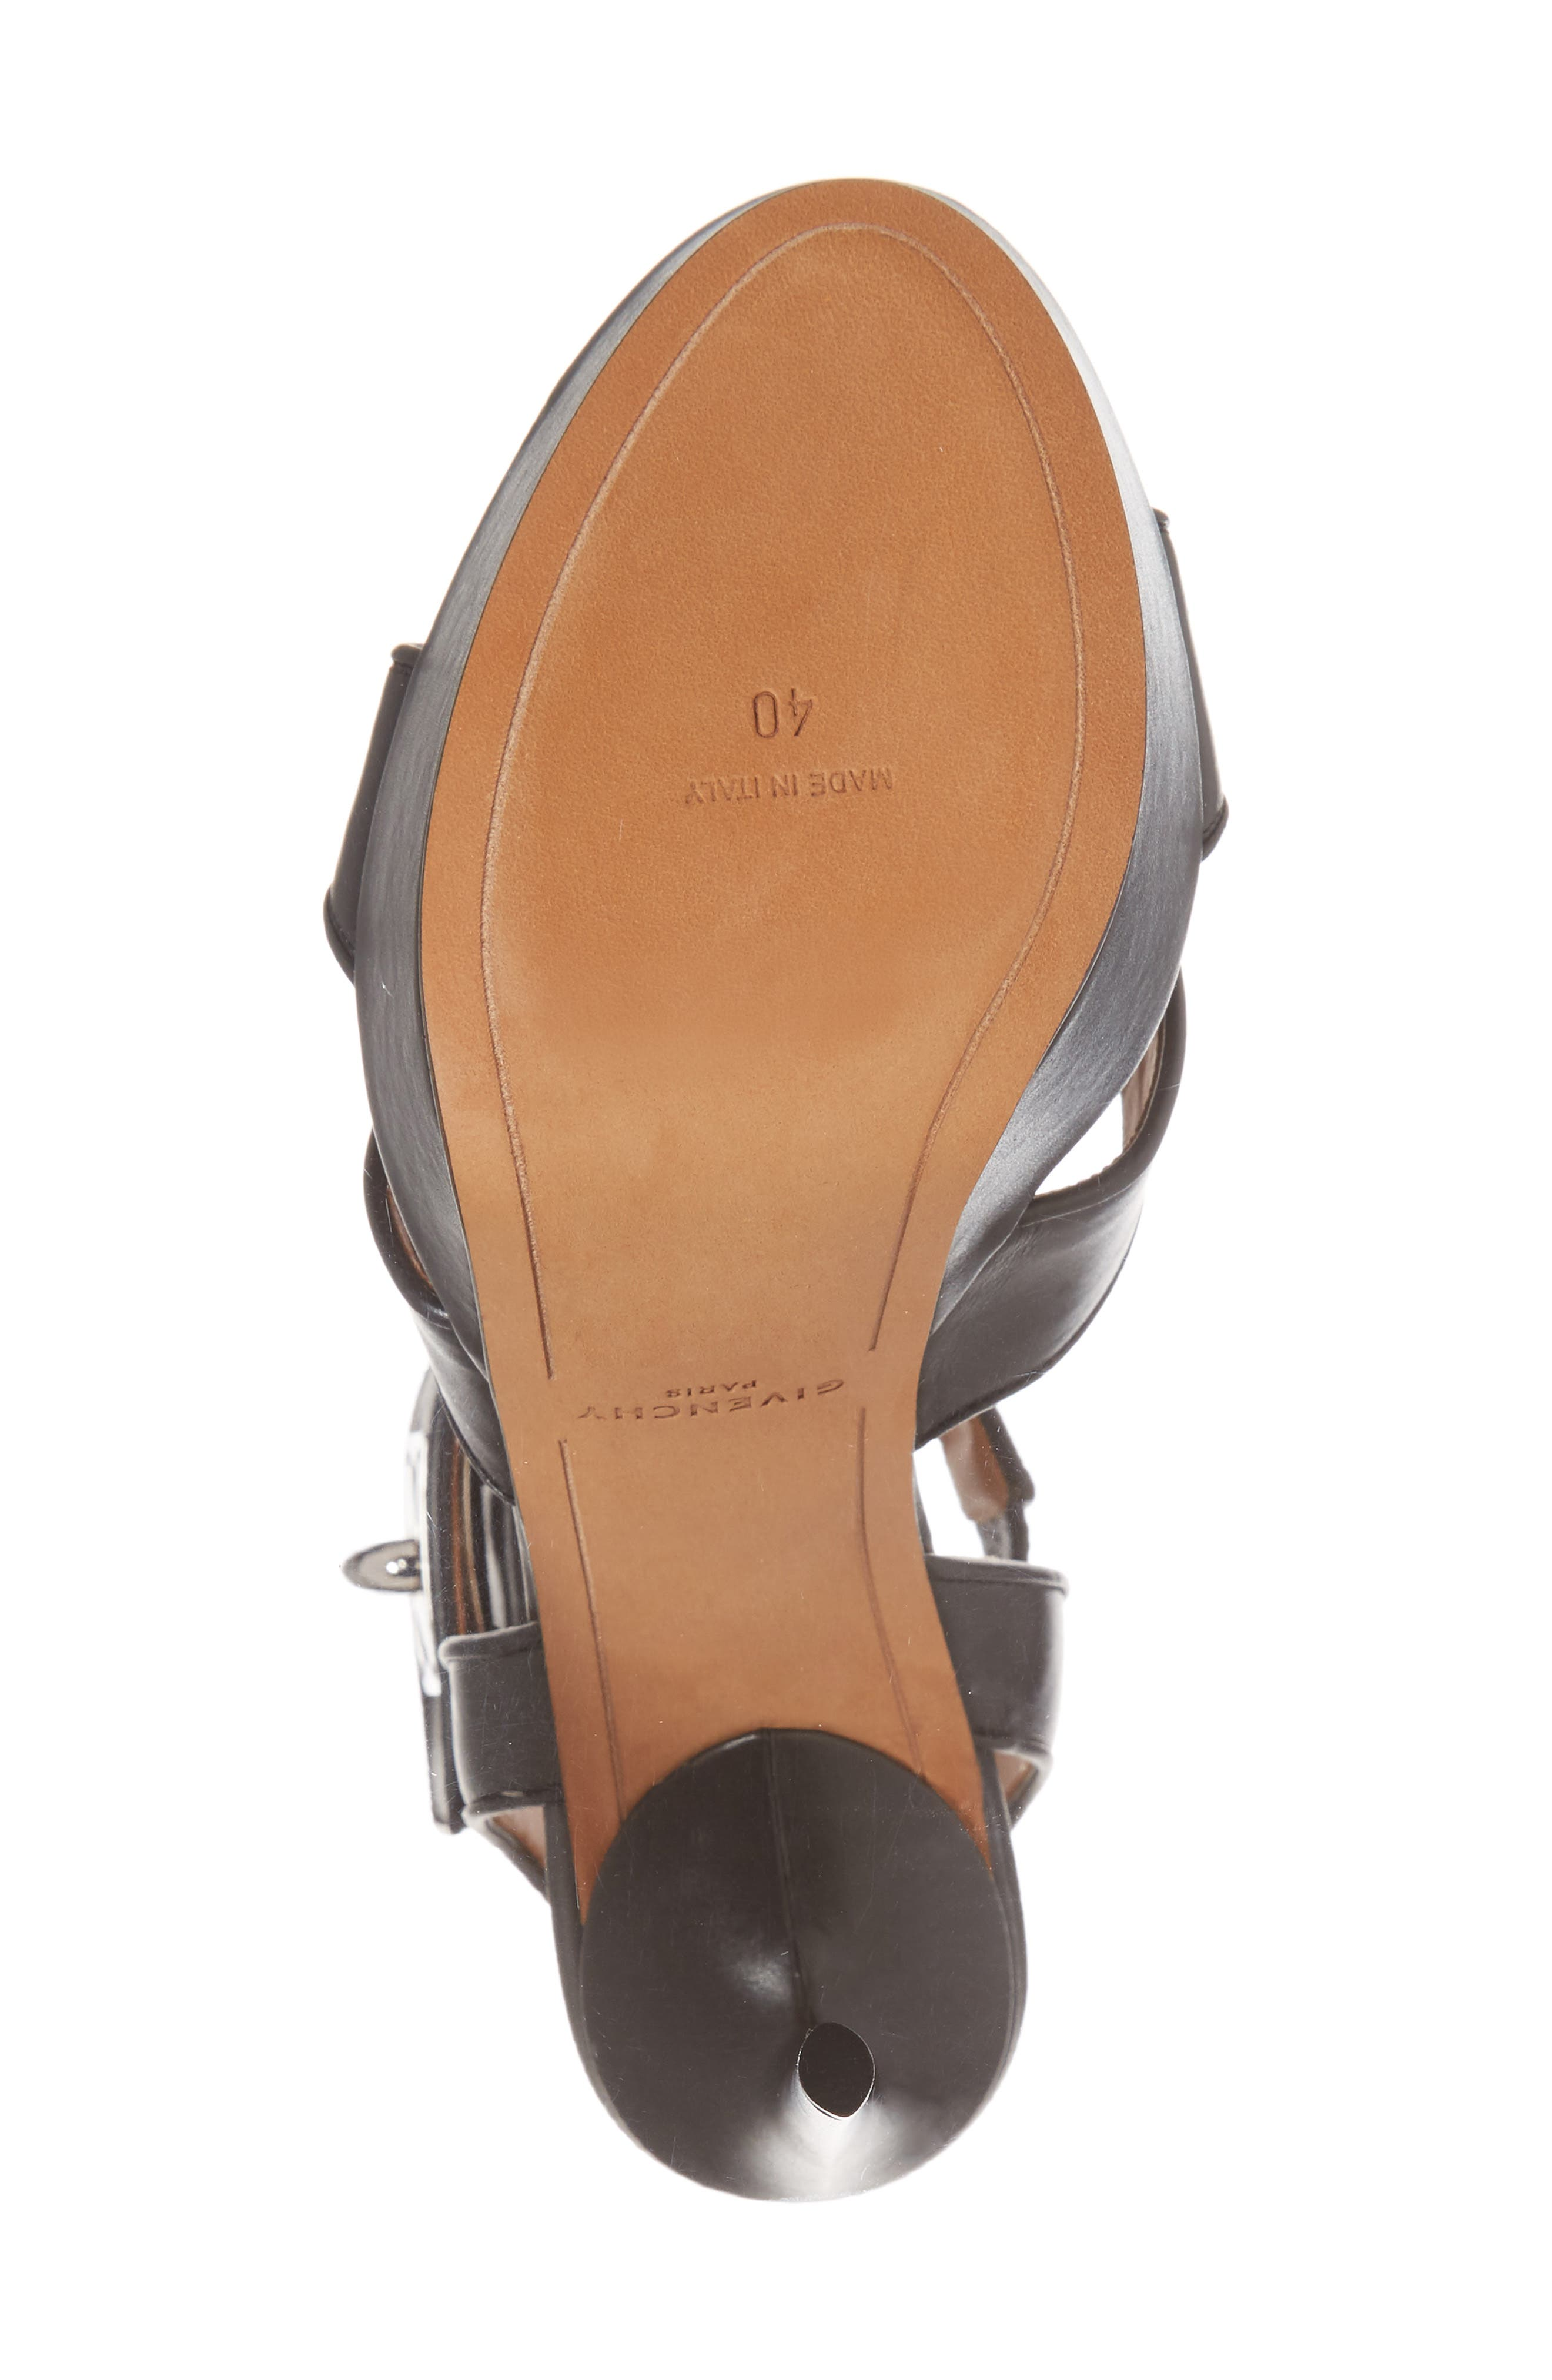 Shark Tooth Platform Sandal,                             Alternate thumbnail 6, color,                             Black